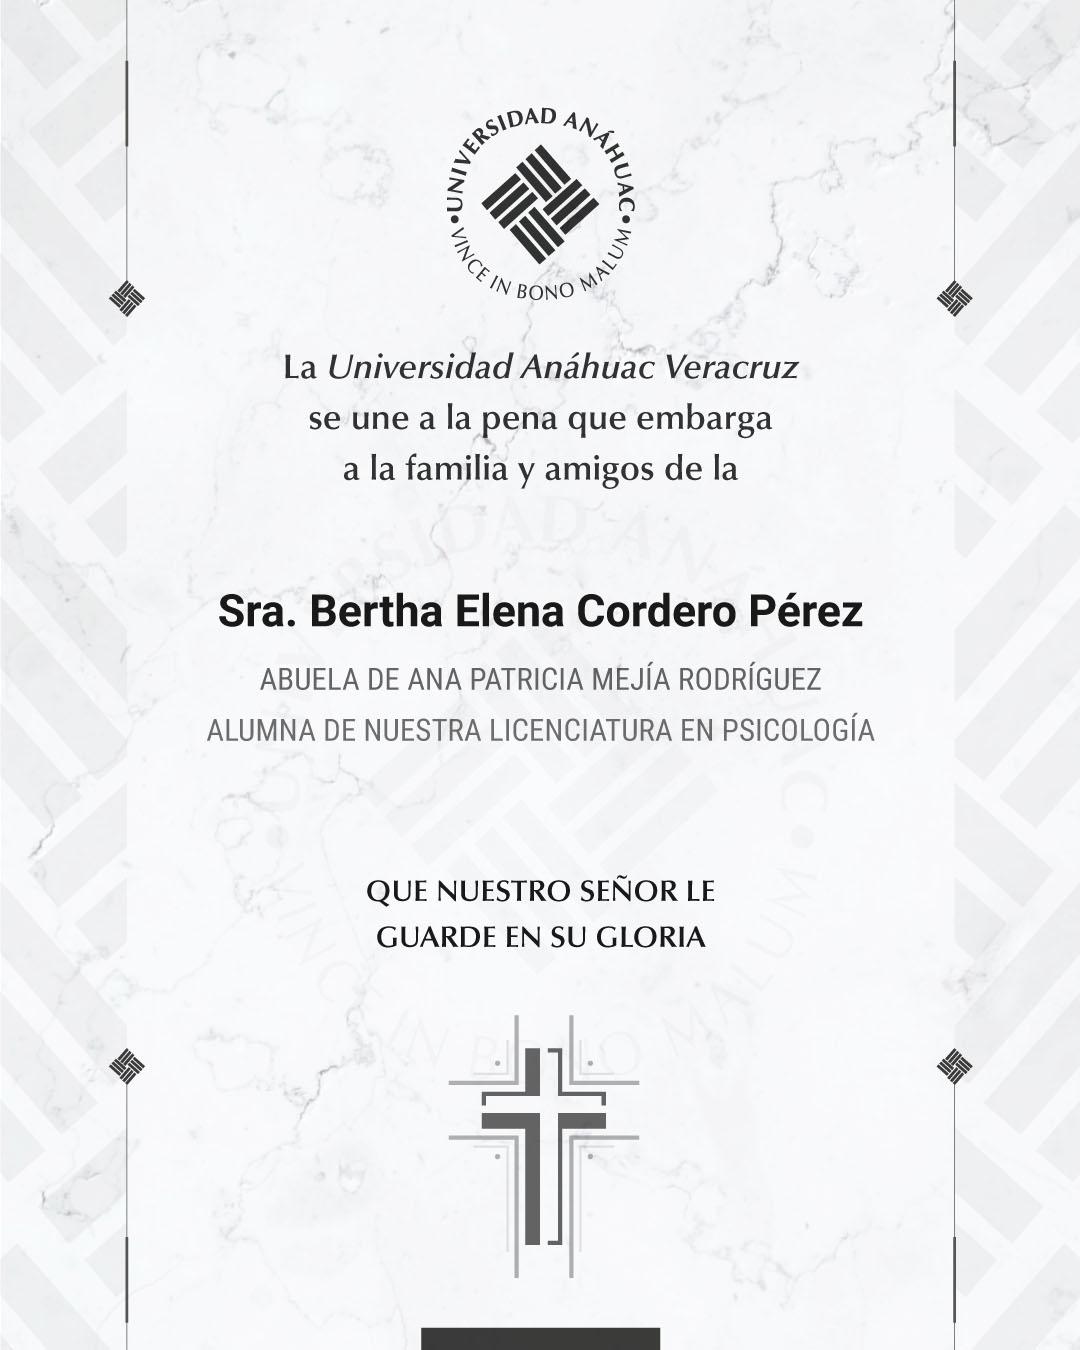 Sra. Bertha Elena Cordedo Pérez